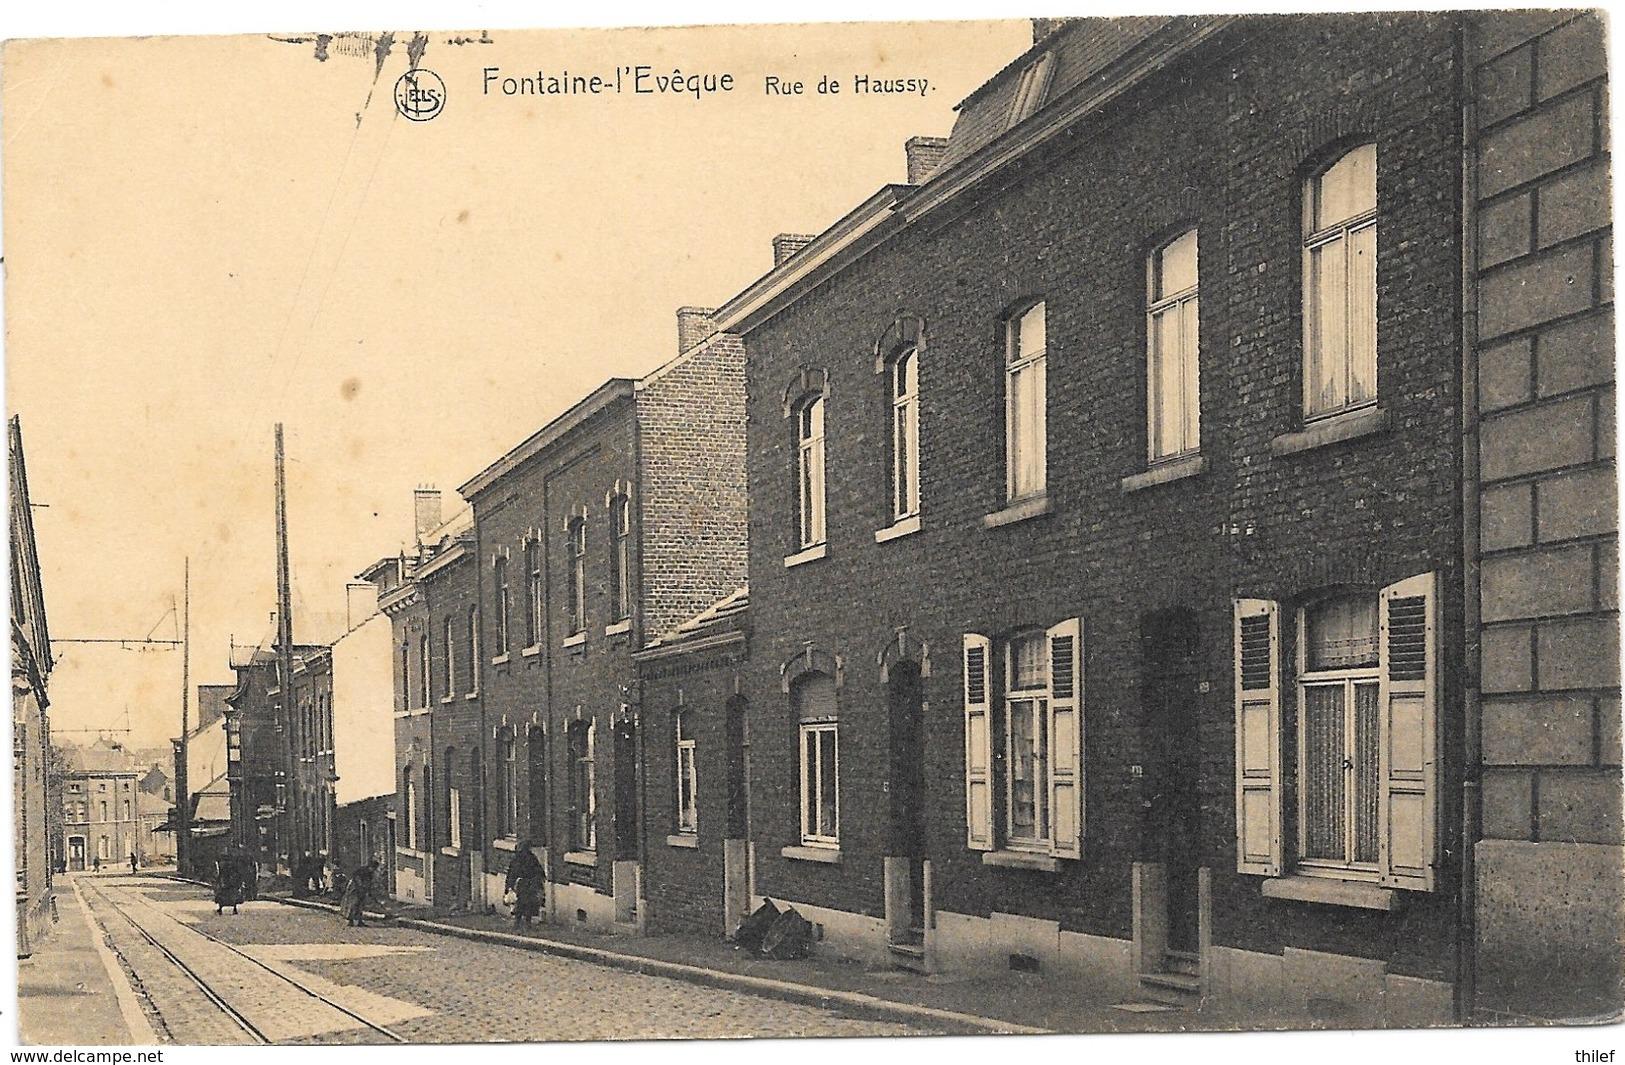 Fontaine-l'Evêque NA66: Rue De Haussy - Fontaine-l'Evêque